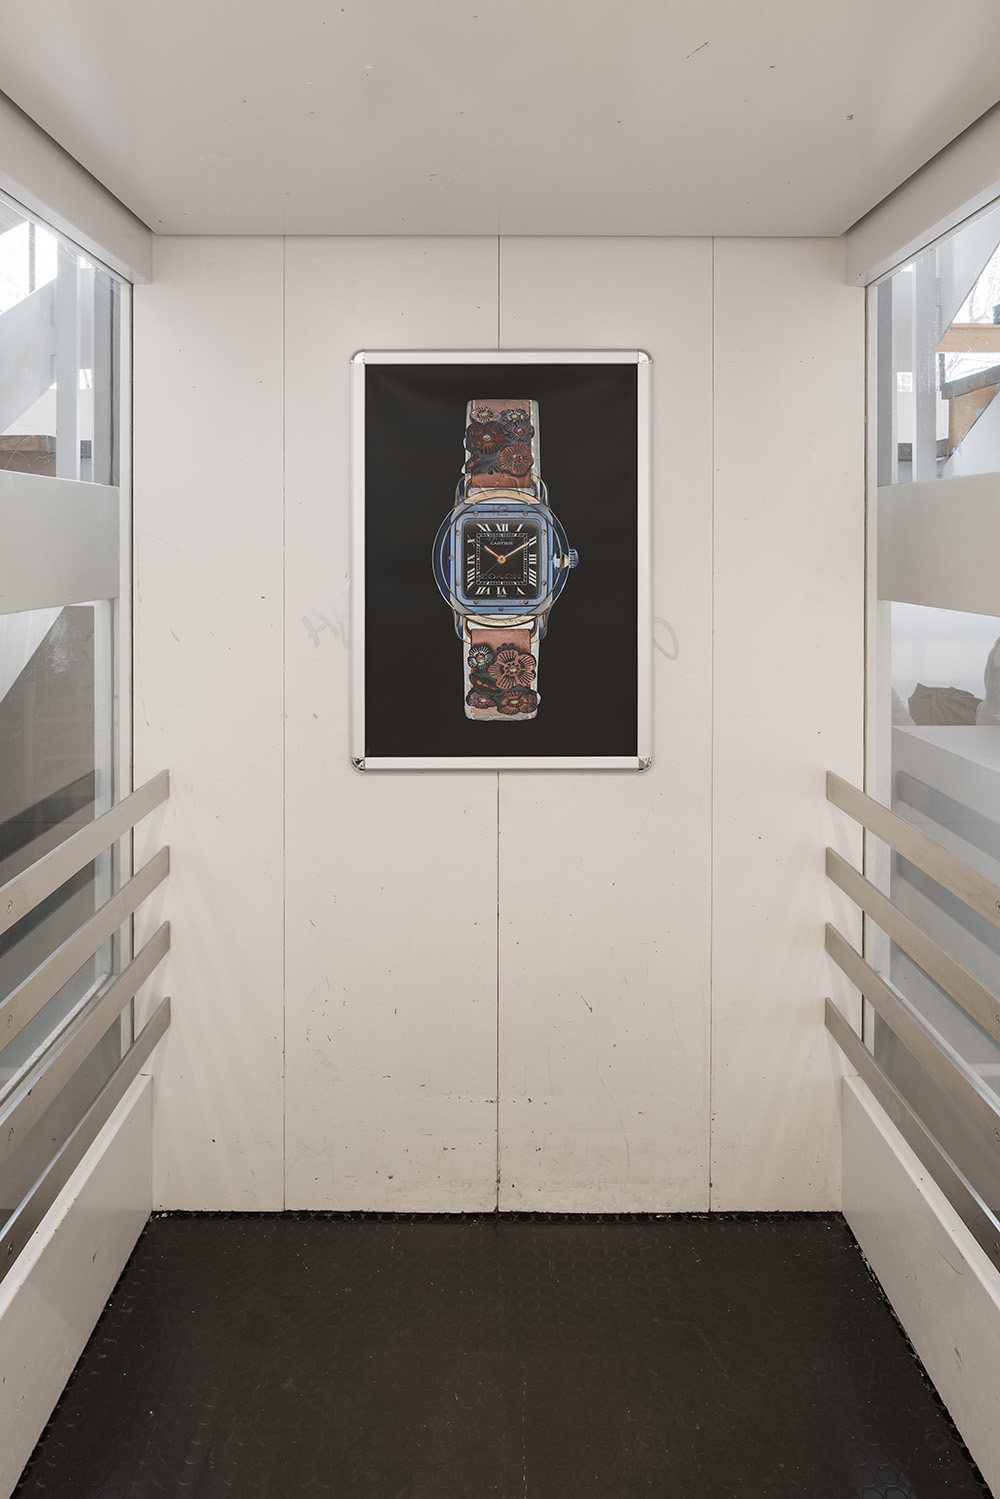 Afgang 2018, David Stjernholm, 'Ten Ten', 2018. Installation view, Kunsthal Charlottenborg, 2018. Photo: David Stjernholm.